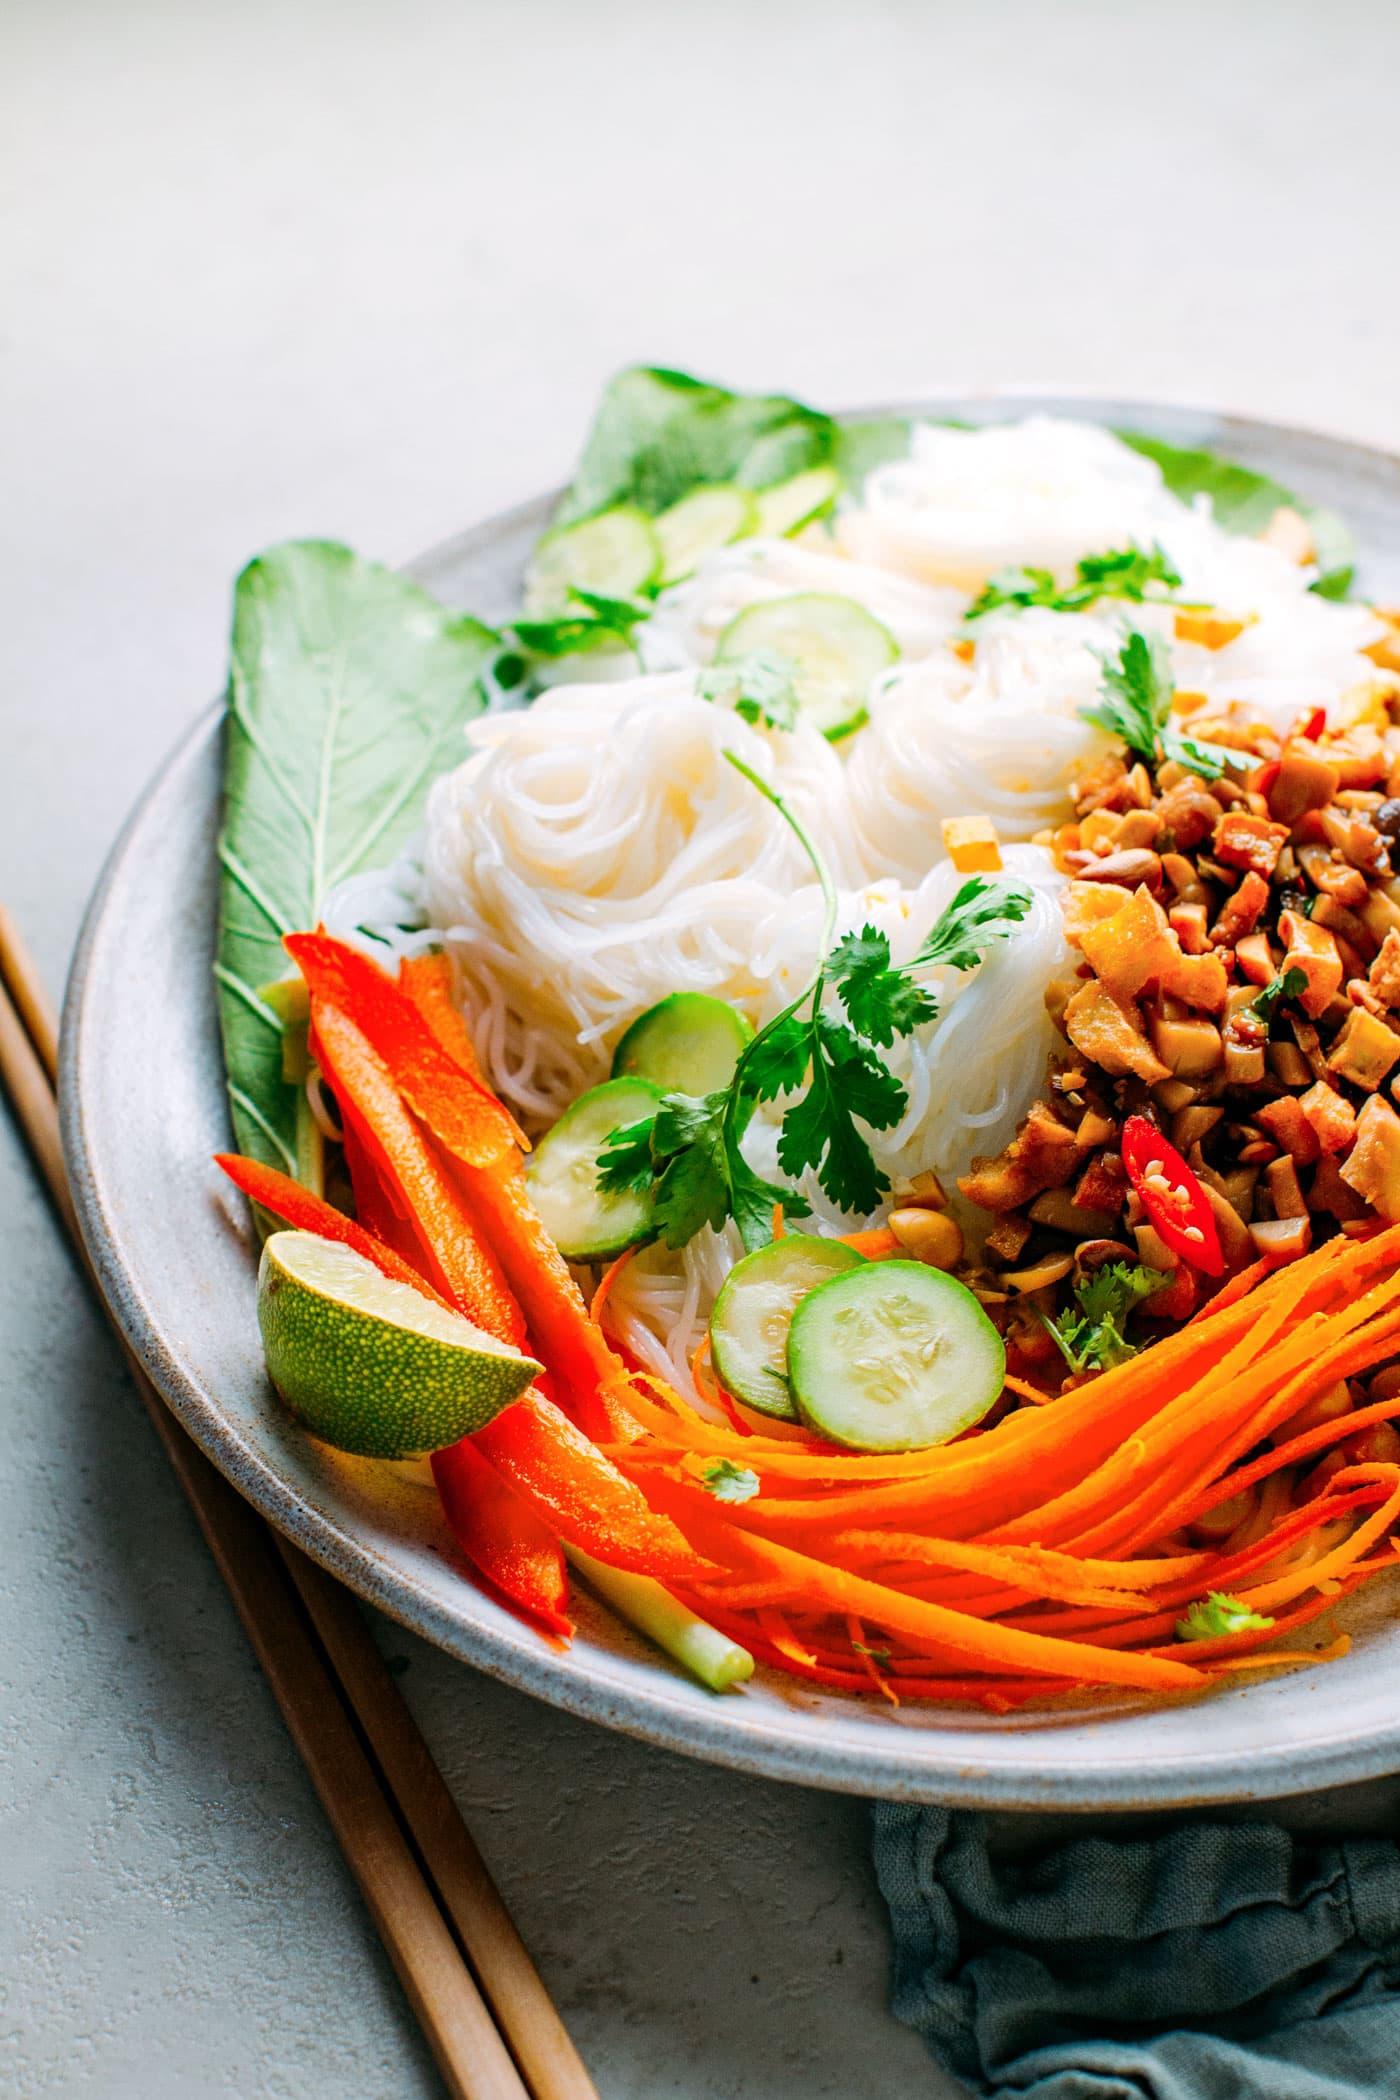 Spicy Noodle Salad with Garlic Mushroom Larb